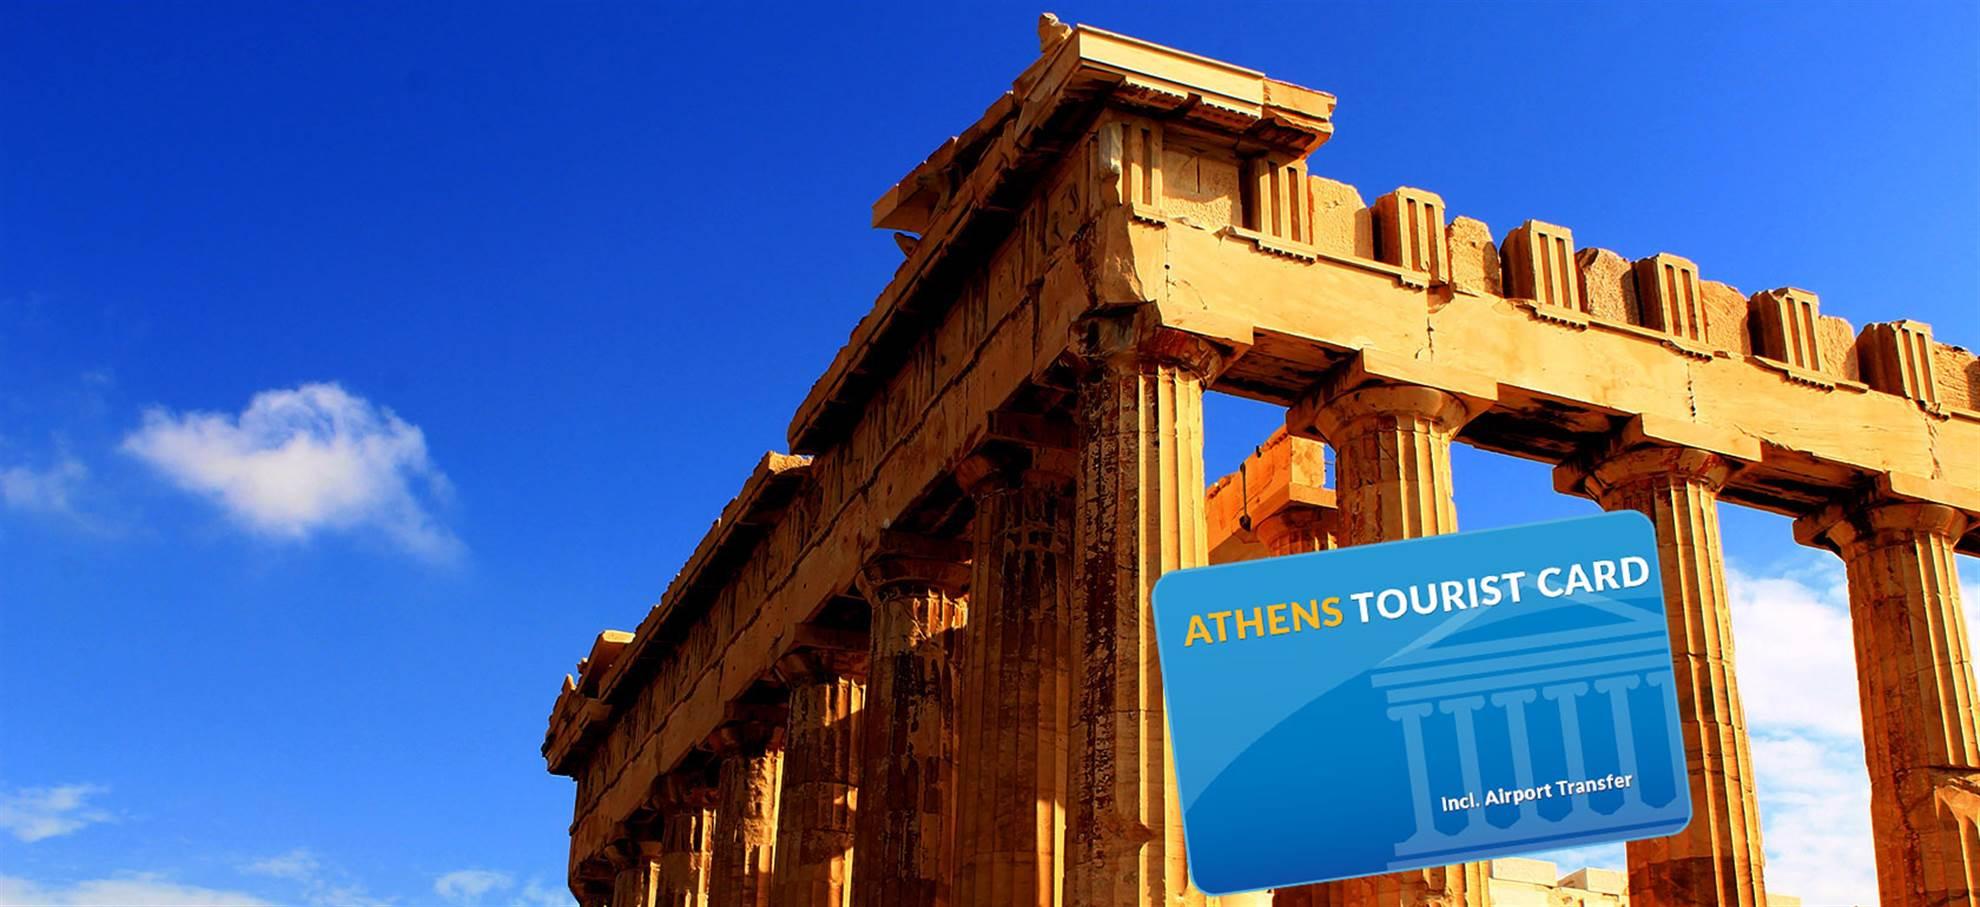 Atenas tourist card (Incl.  Museo del Acrópolis)